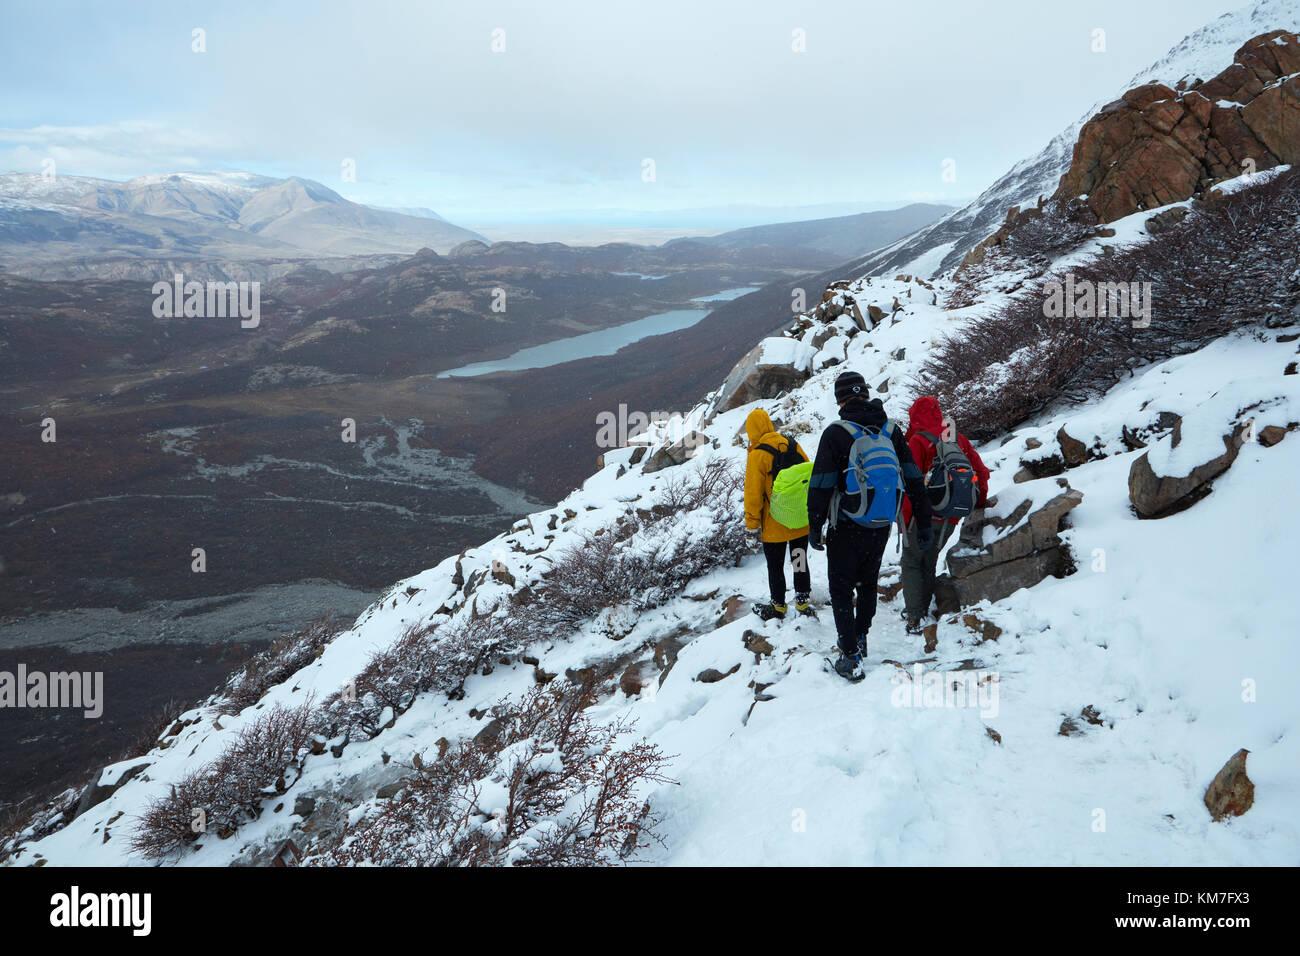 Wanderer im Schnee auf dem Weg zur Laguna de los Tres, Parque Nacional Los Glaciares (World Heritage Area), Patagonien, Stockbild